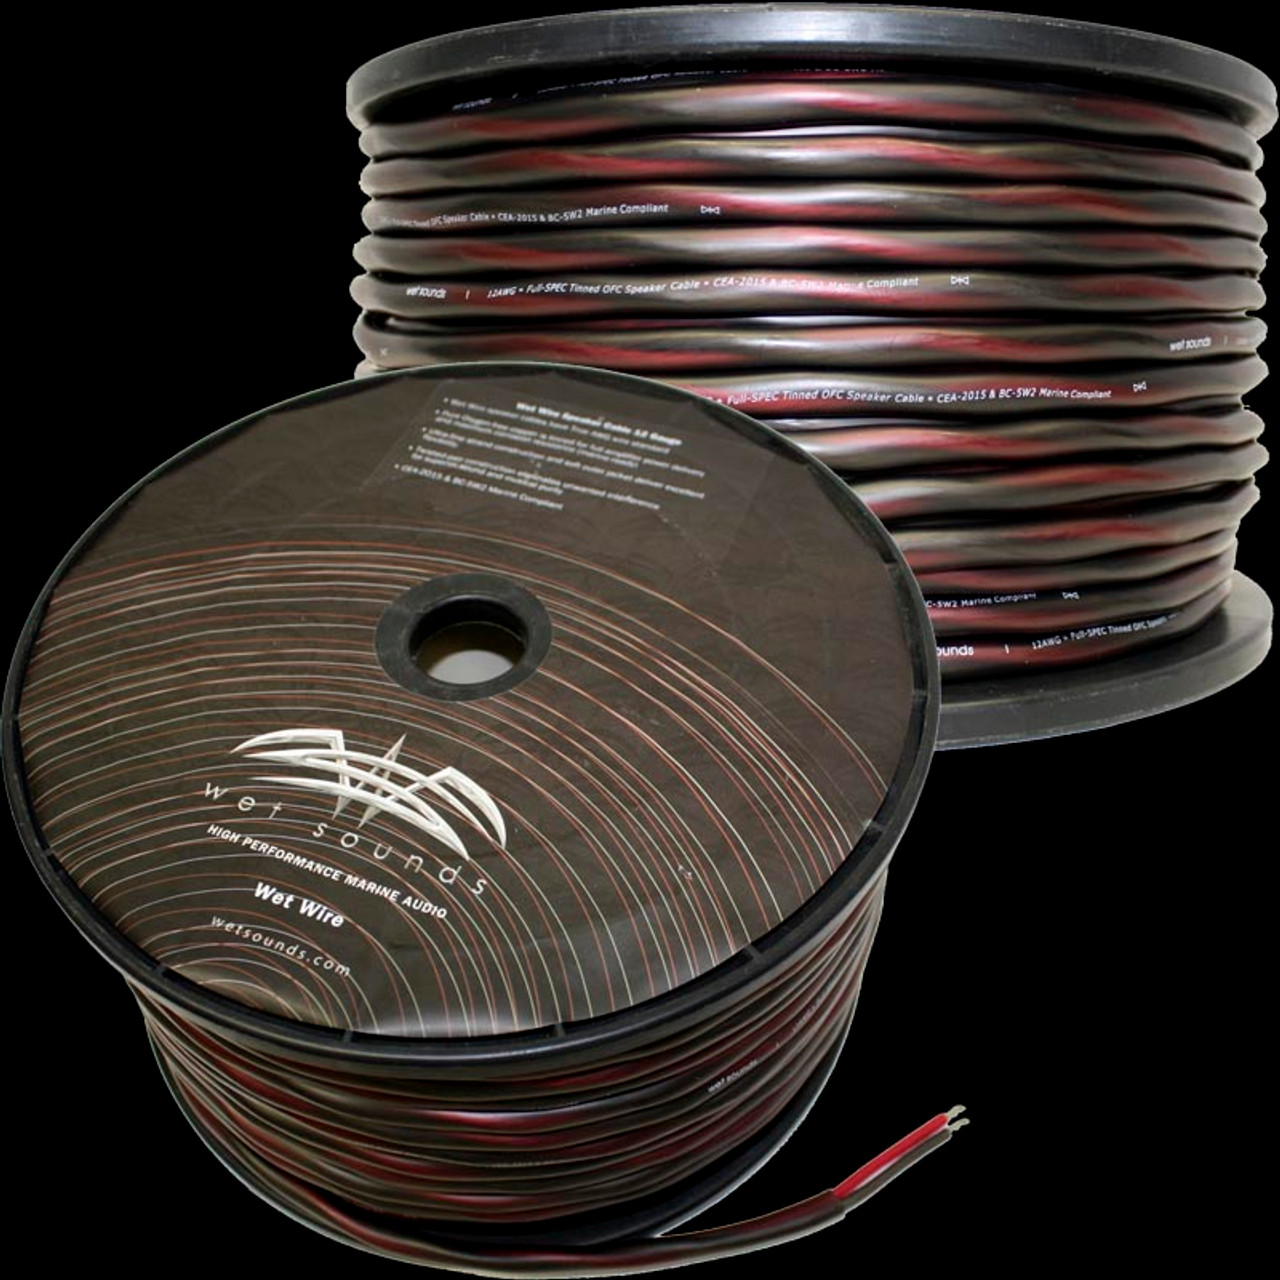 Wet Sounds 12 Gauge Speaker Wire - 250 feet